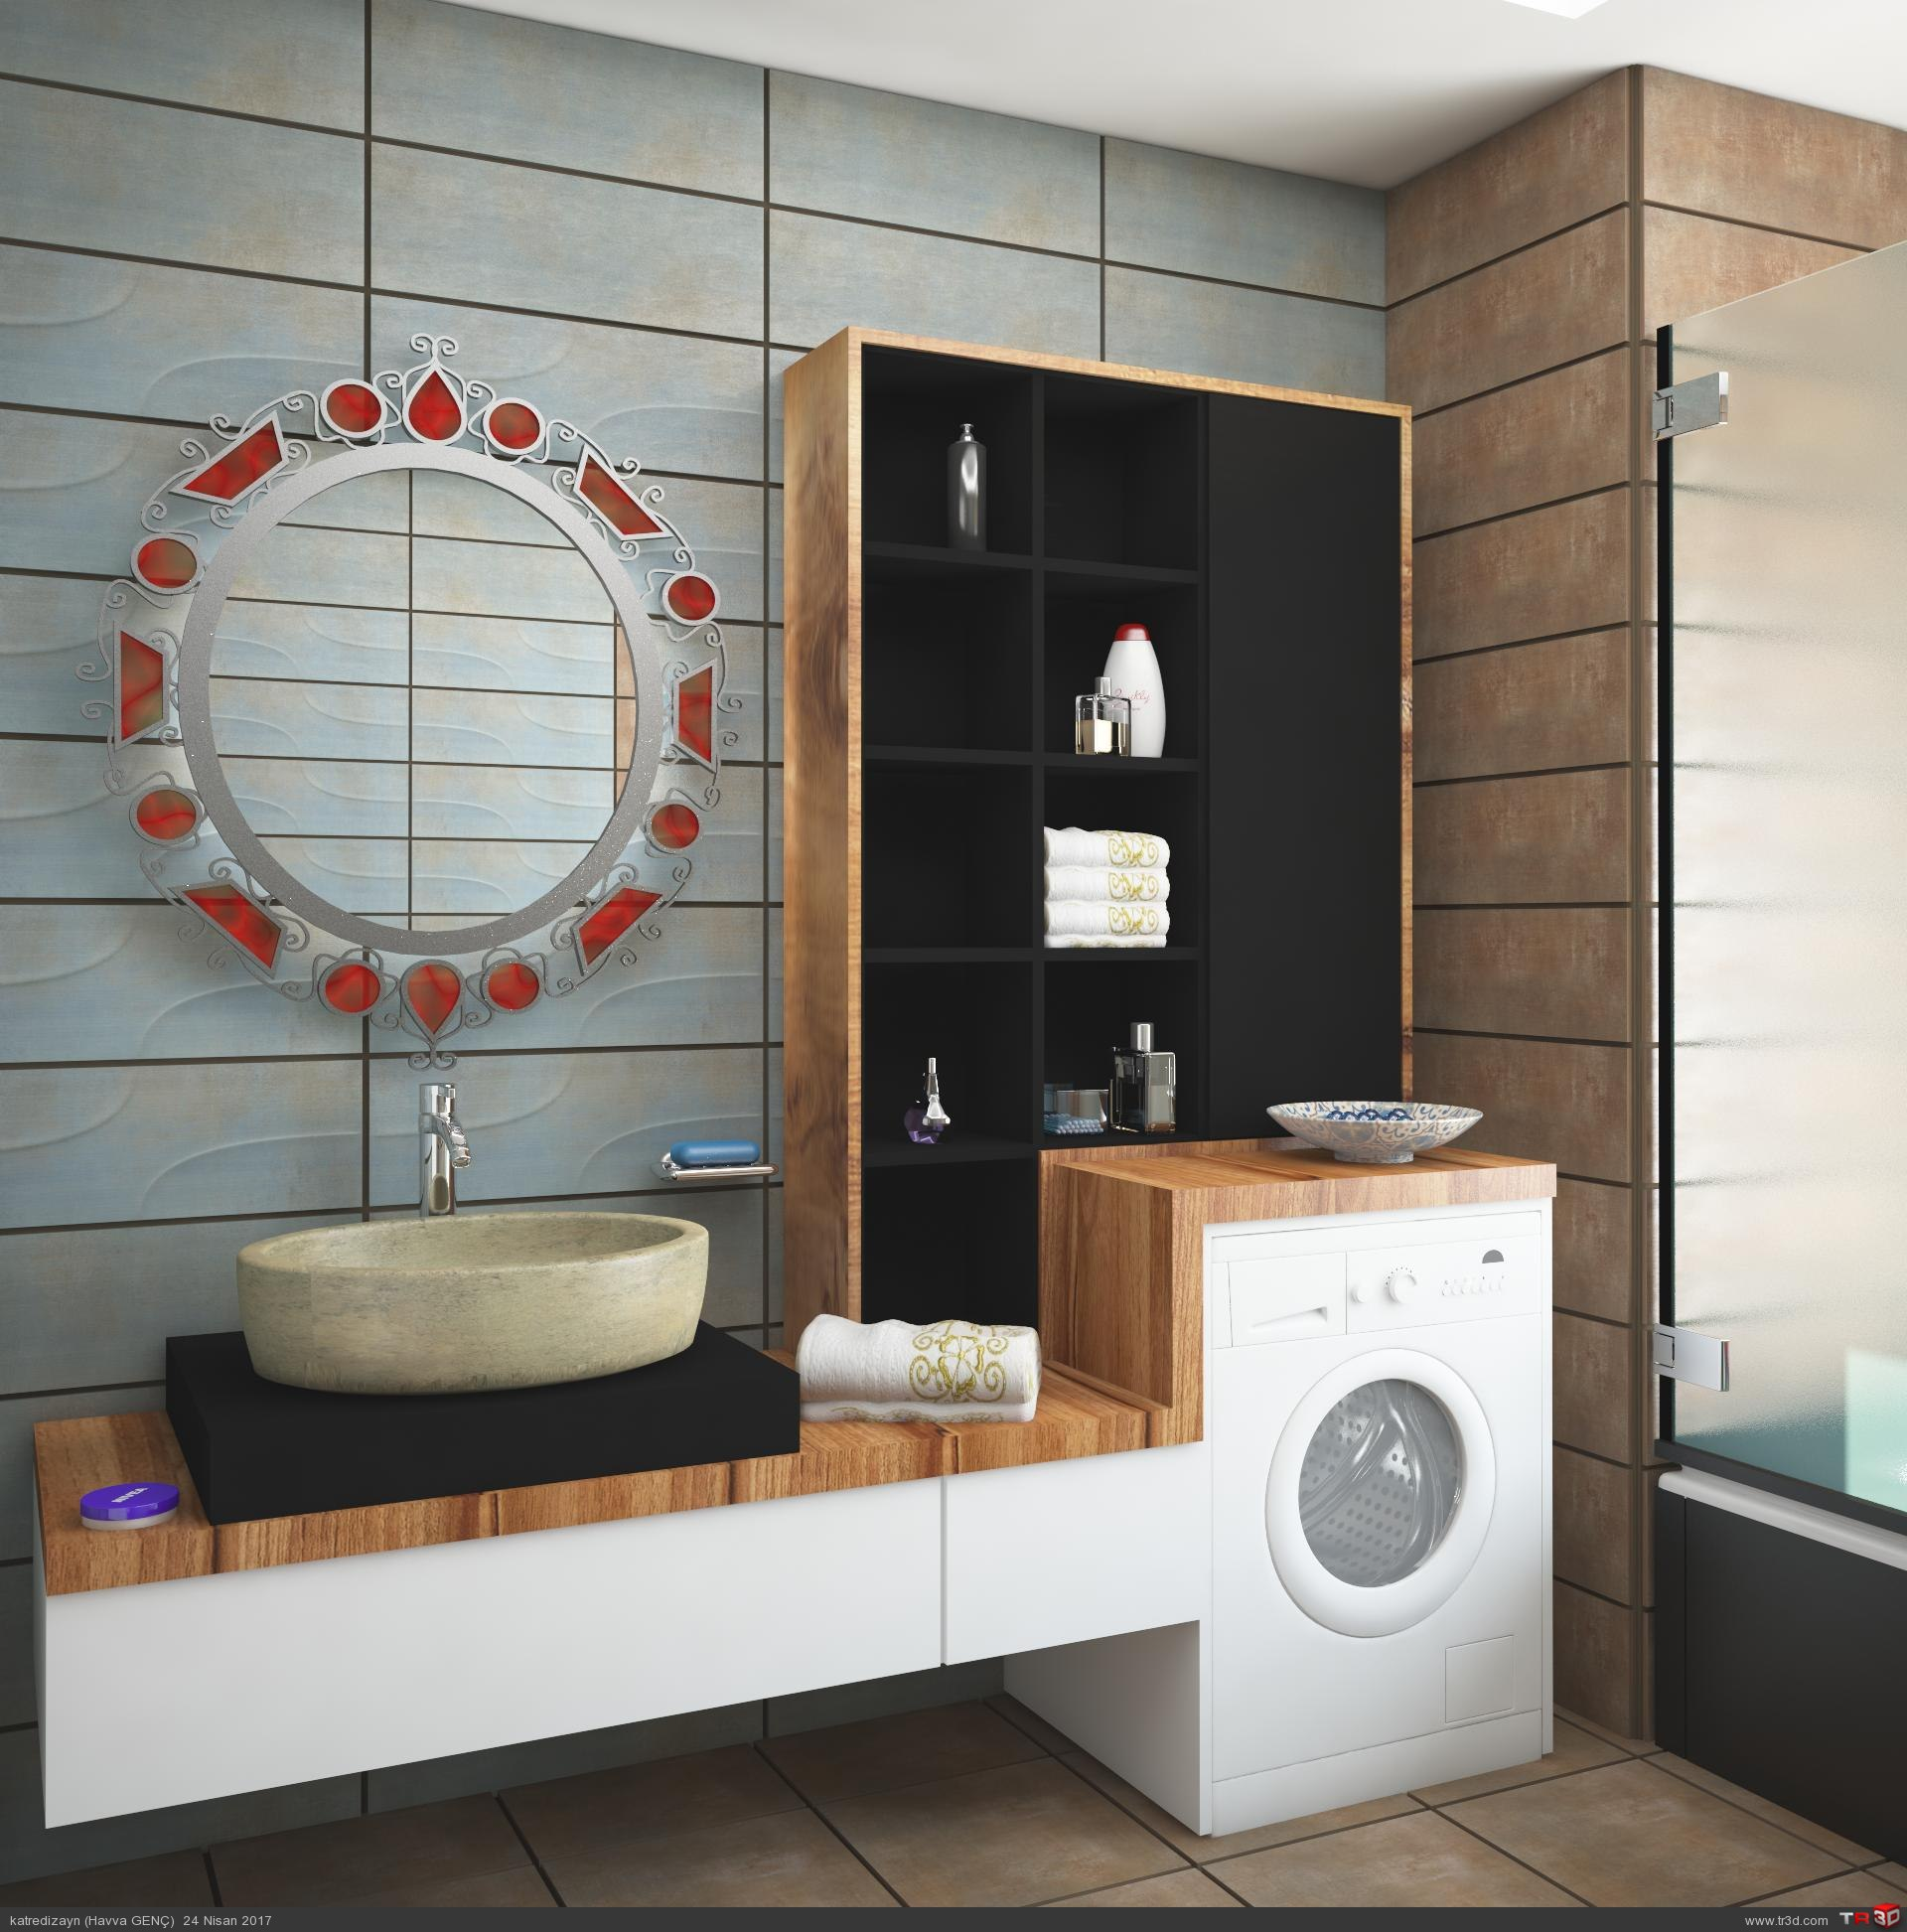 Müşteri banyo dolabı tasarımı